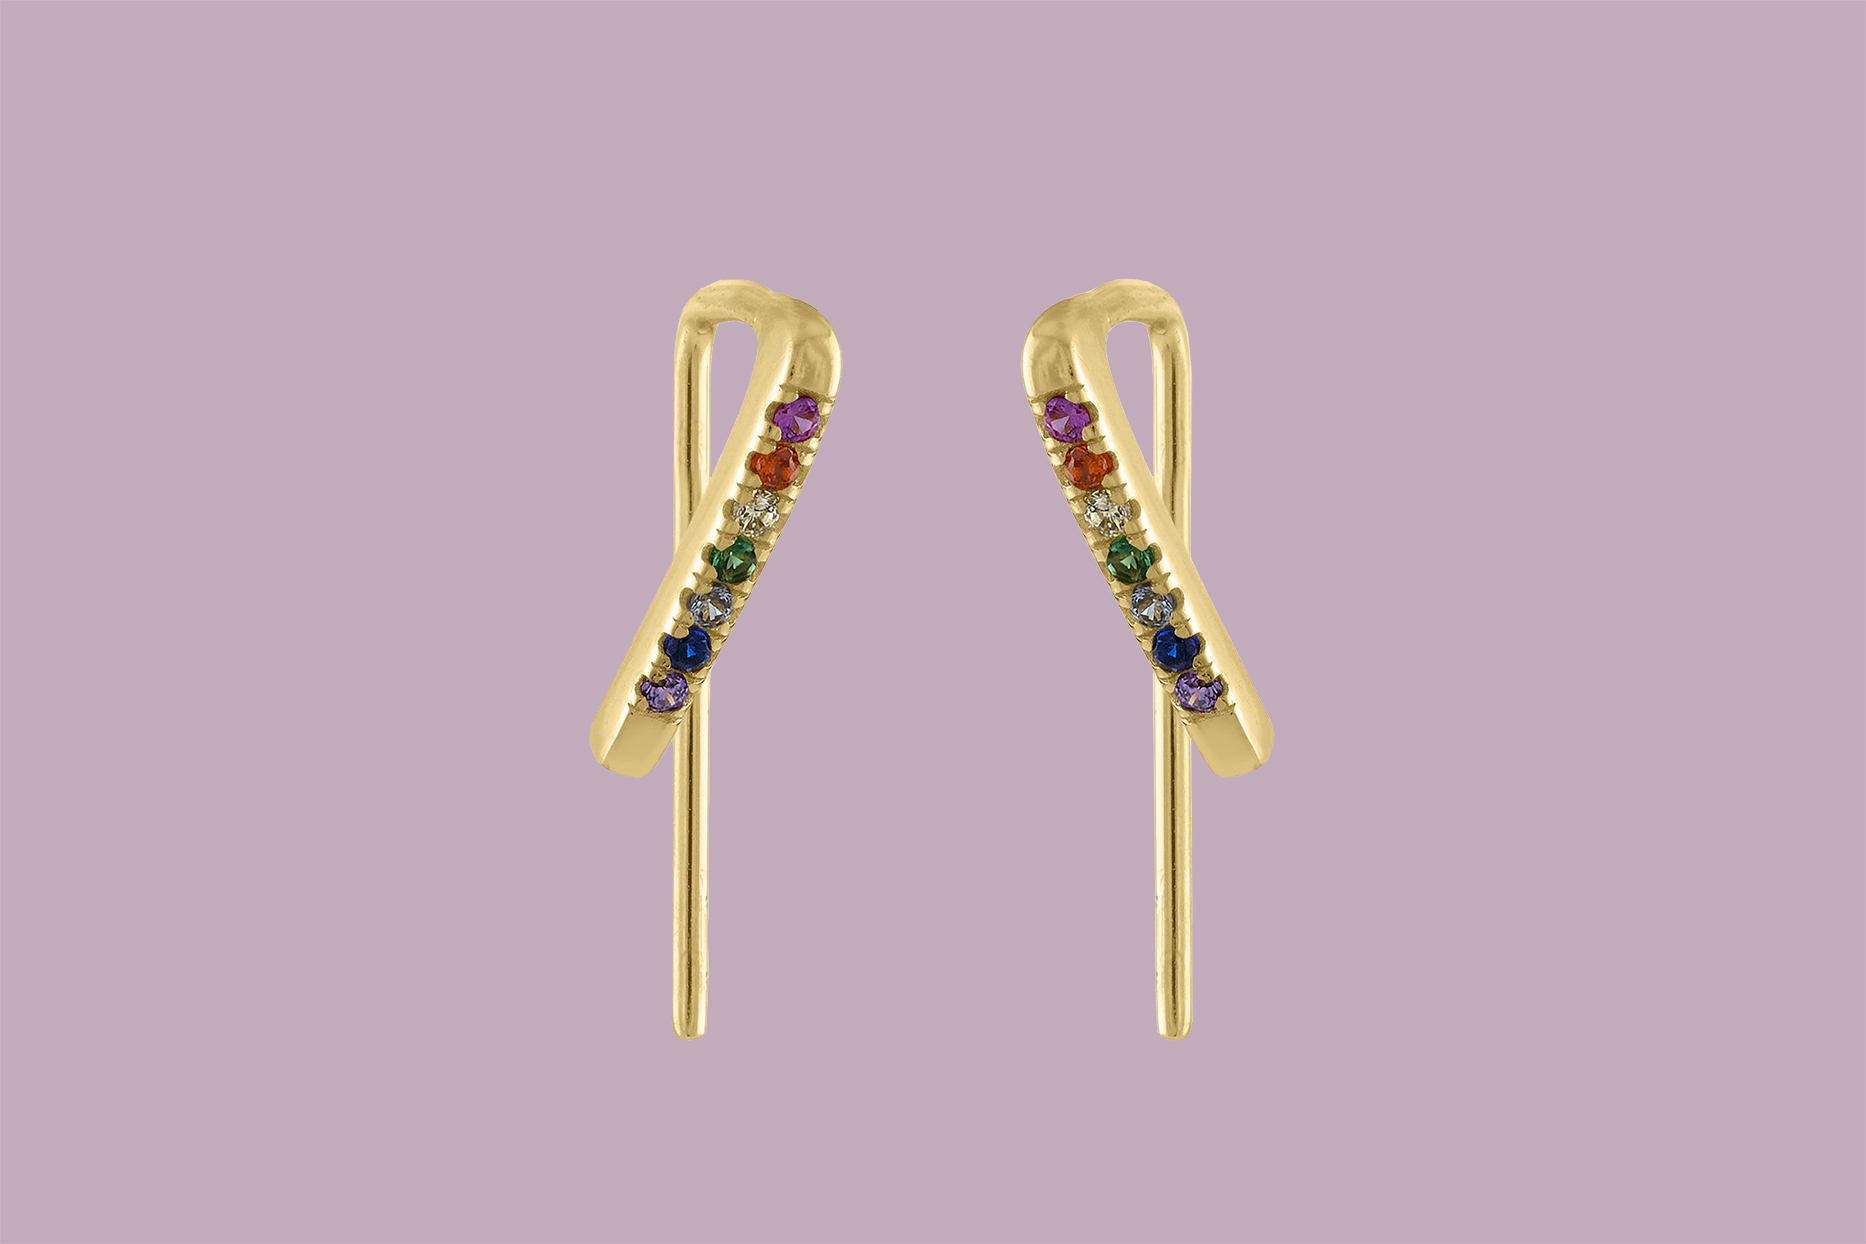 bridesmaid gift maison miru gold climber earrings